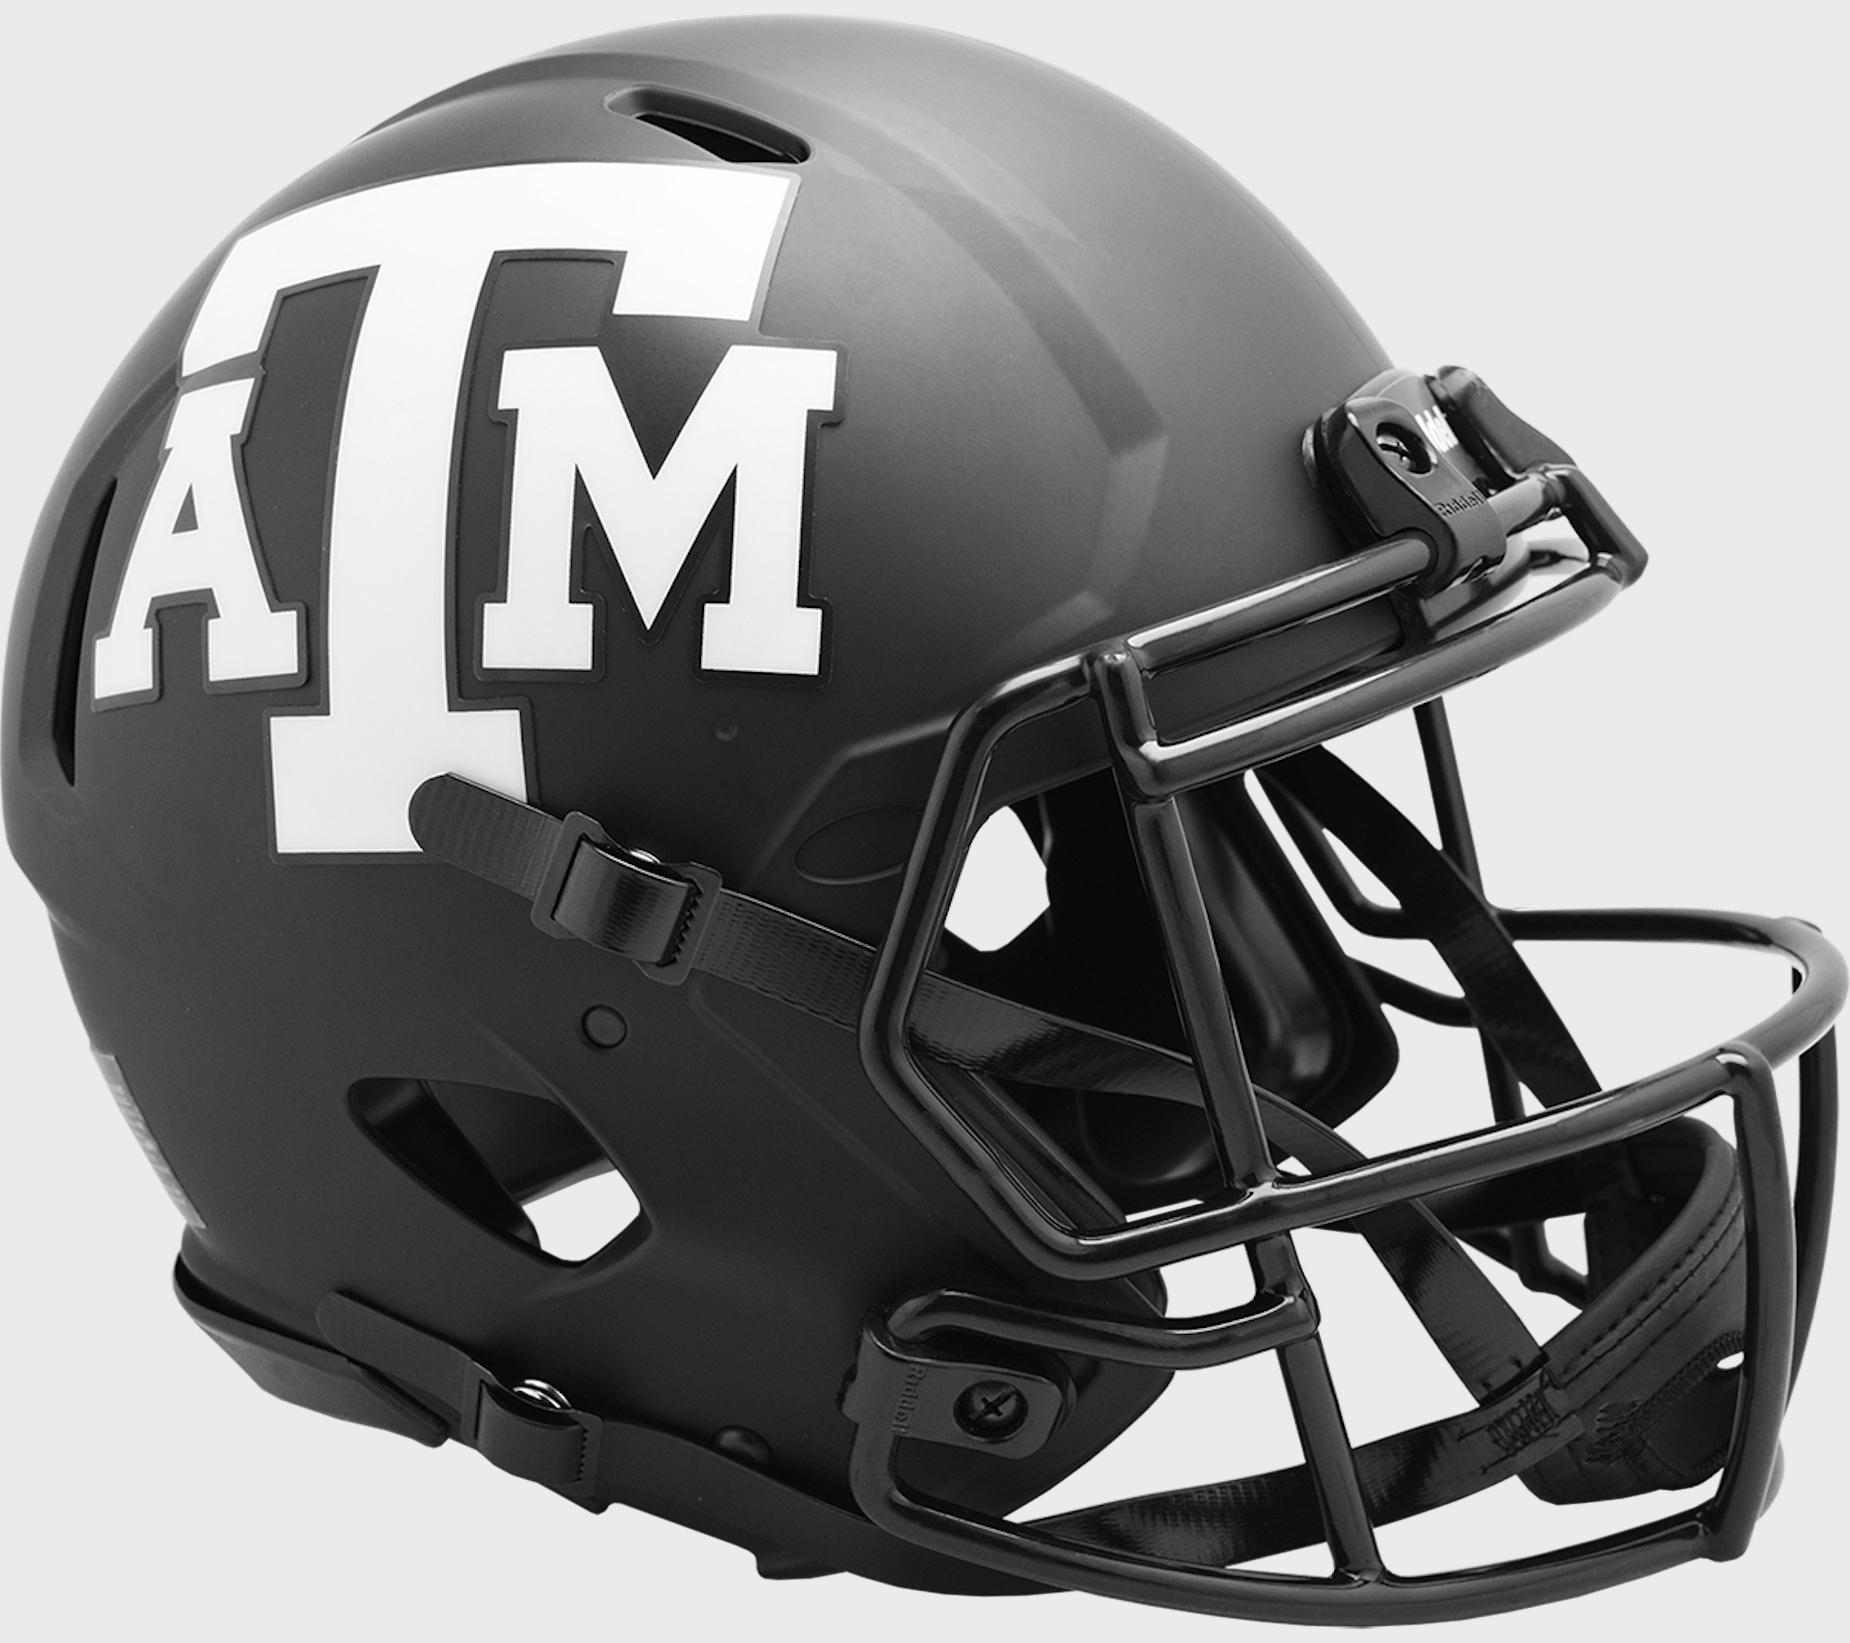 Texas A&M Aggies Speed Football Helmet <B>ECLIPSE</B>